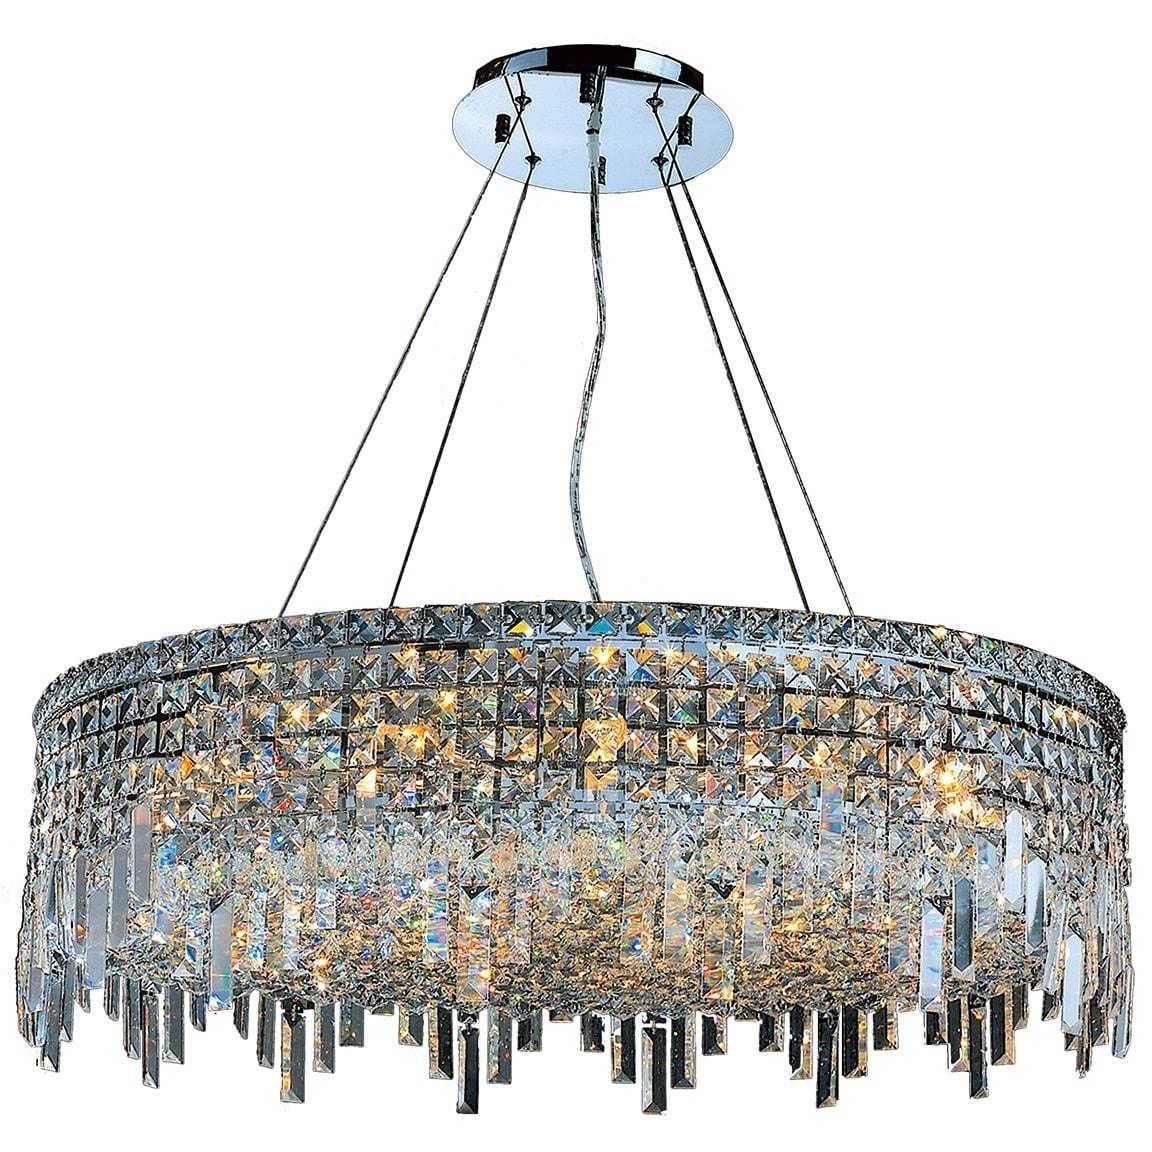 Glam Art Deco Style 18 Light Chrome Finish Crystal Round Flush Mount Chandelier Large Chandelier On Sale Overstock 13061864